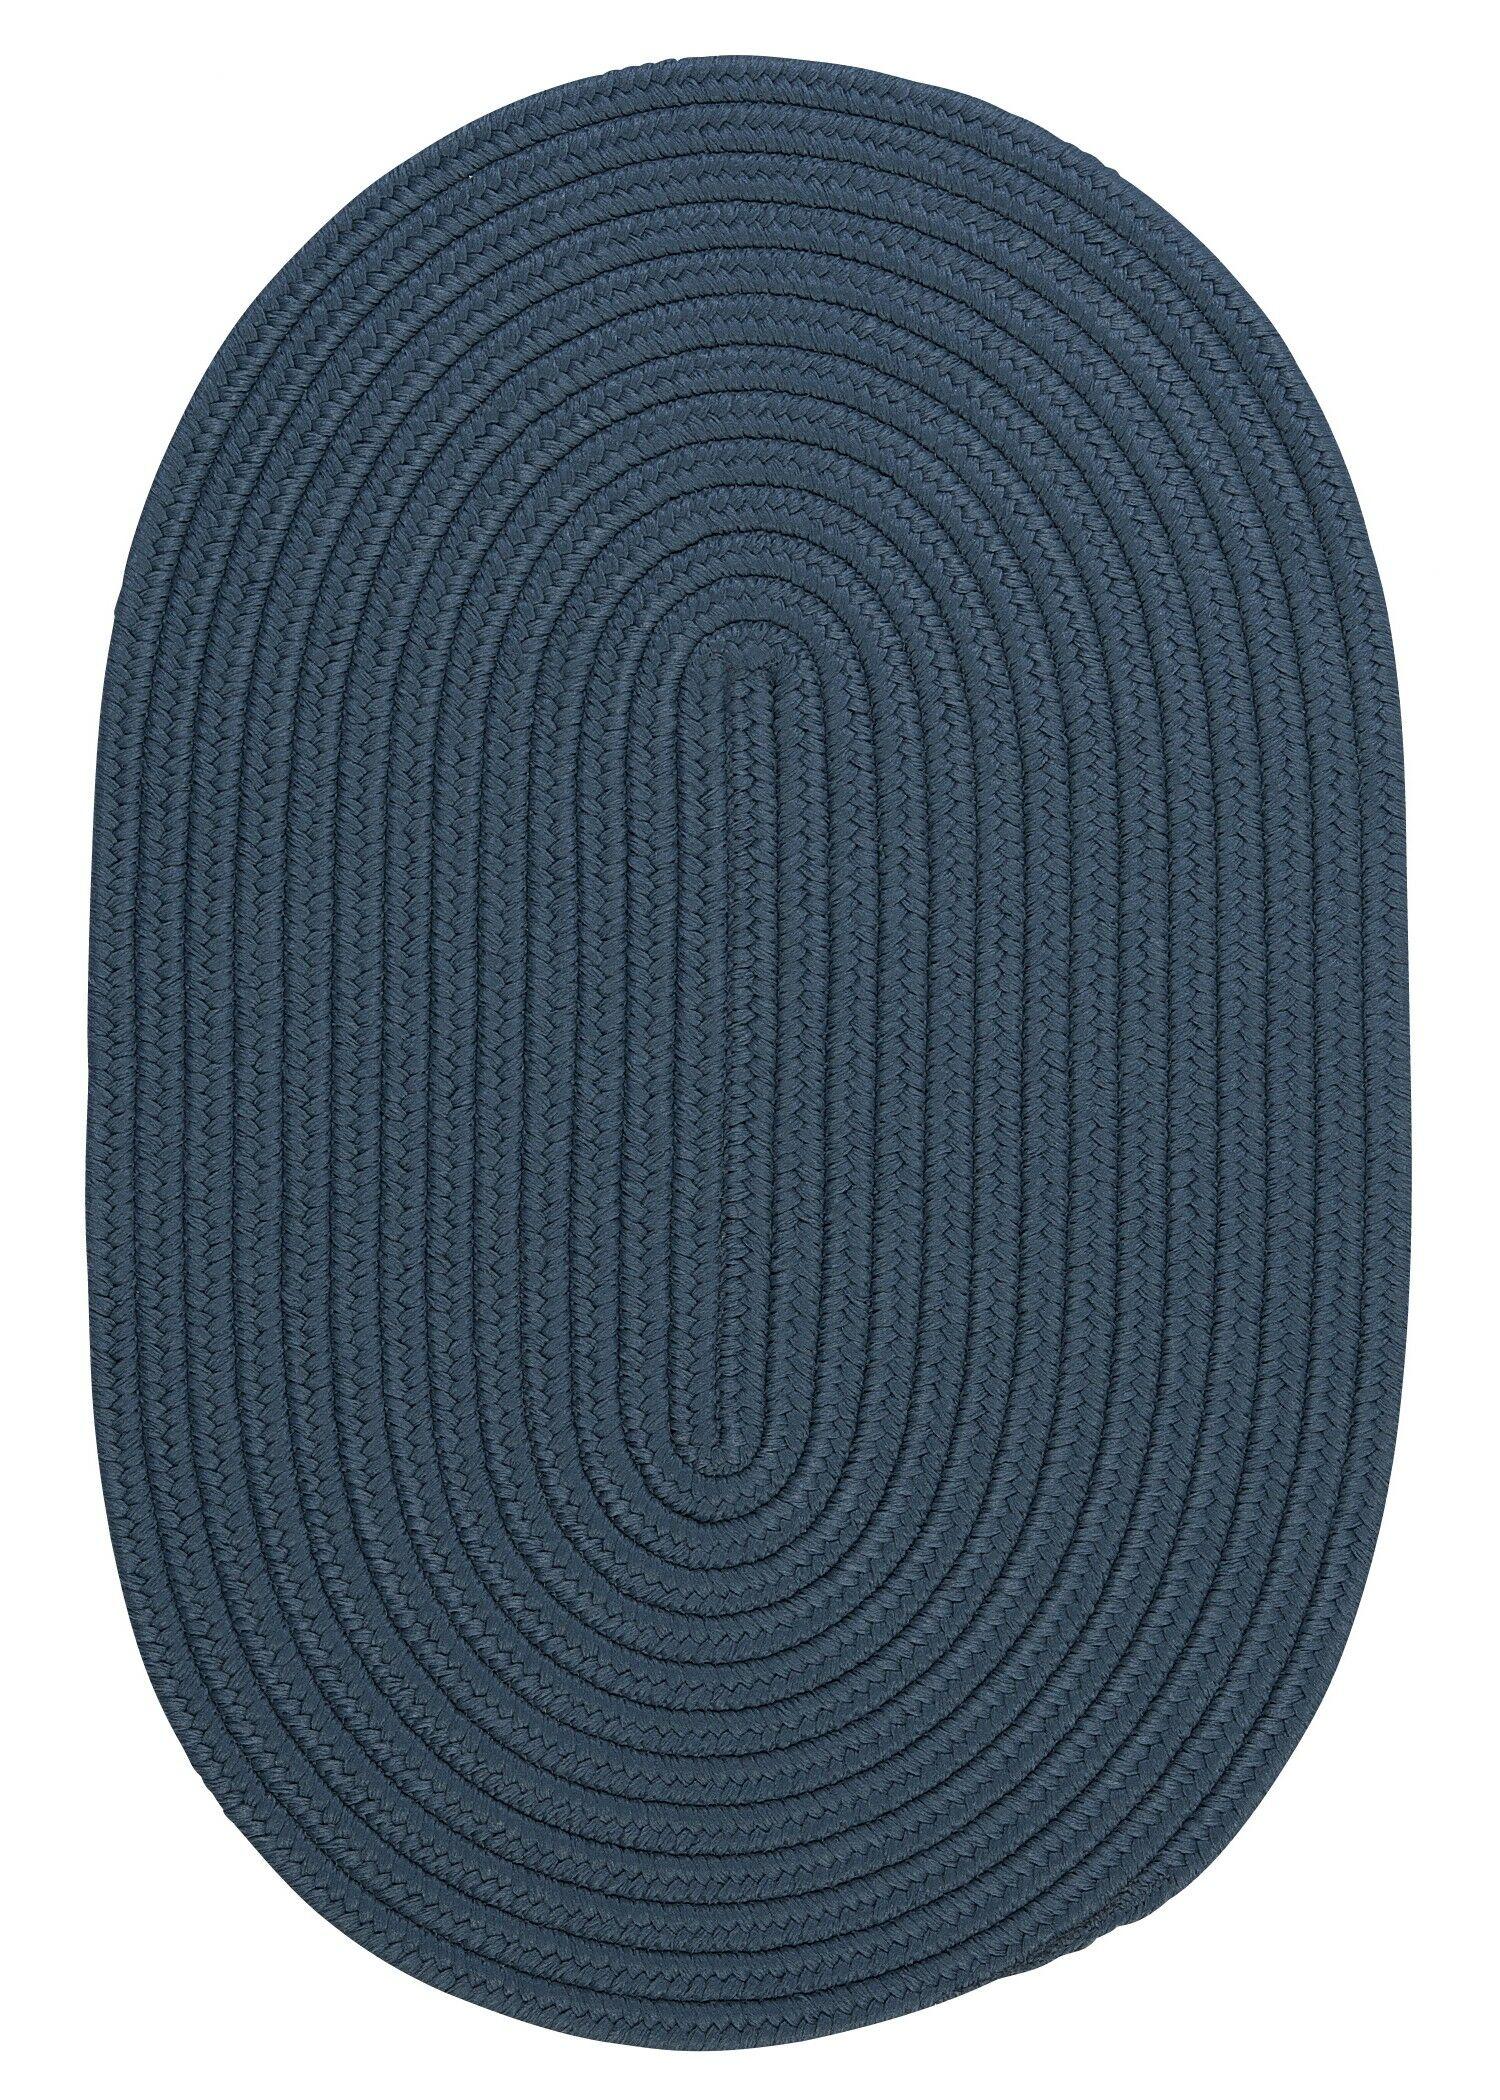 Mcintyre Blue Indoor/Outdoor Area Rug Rug Size: Oval 8' x 11'